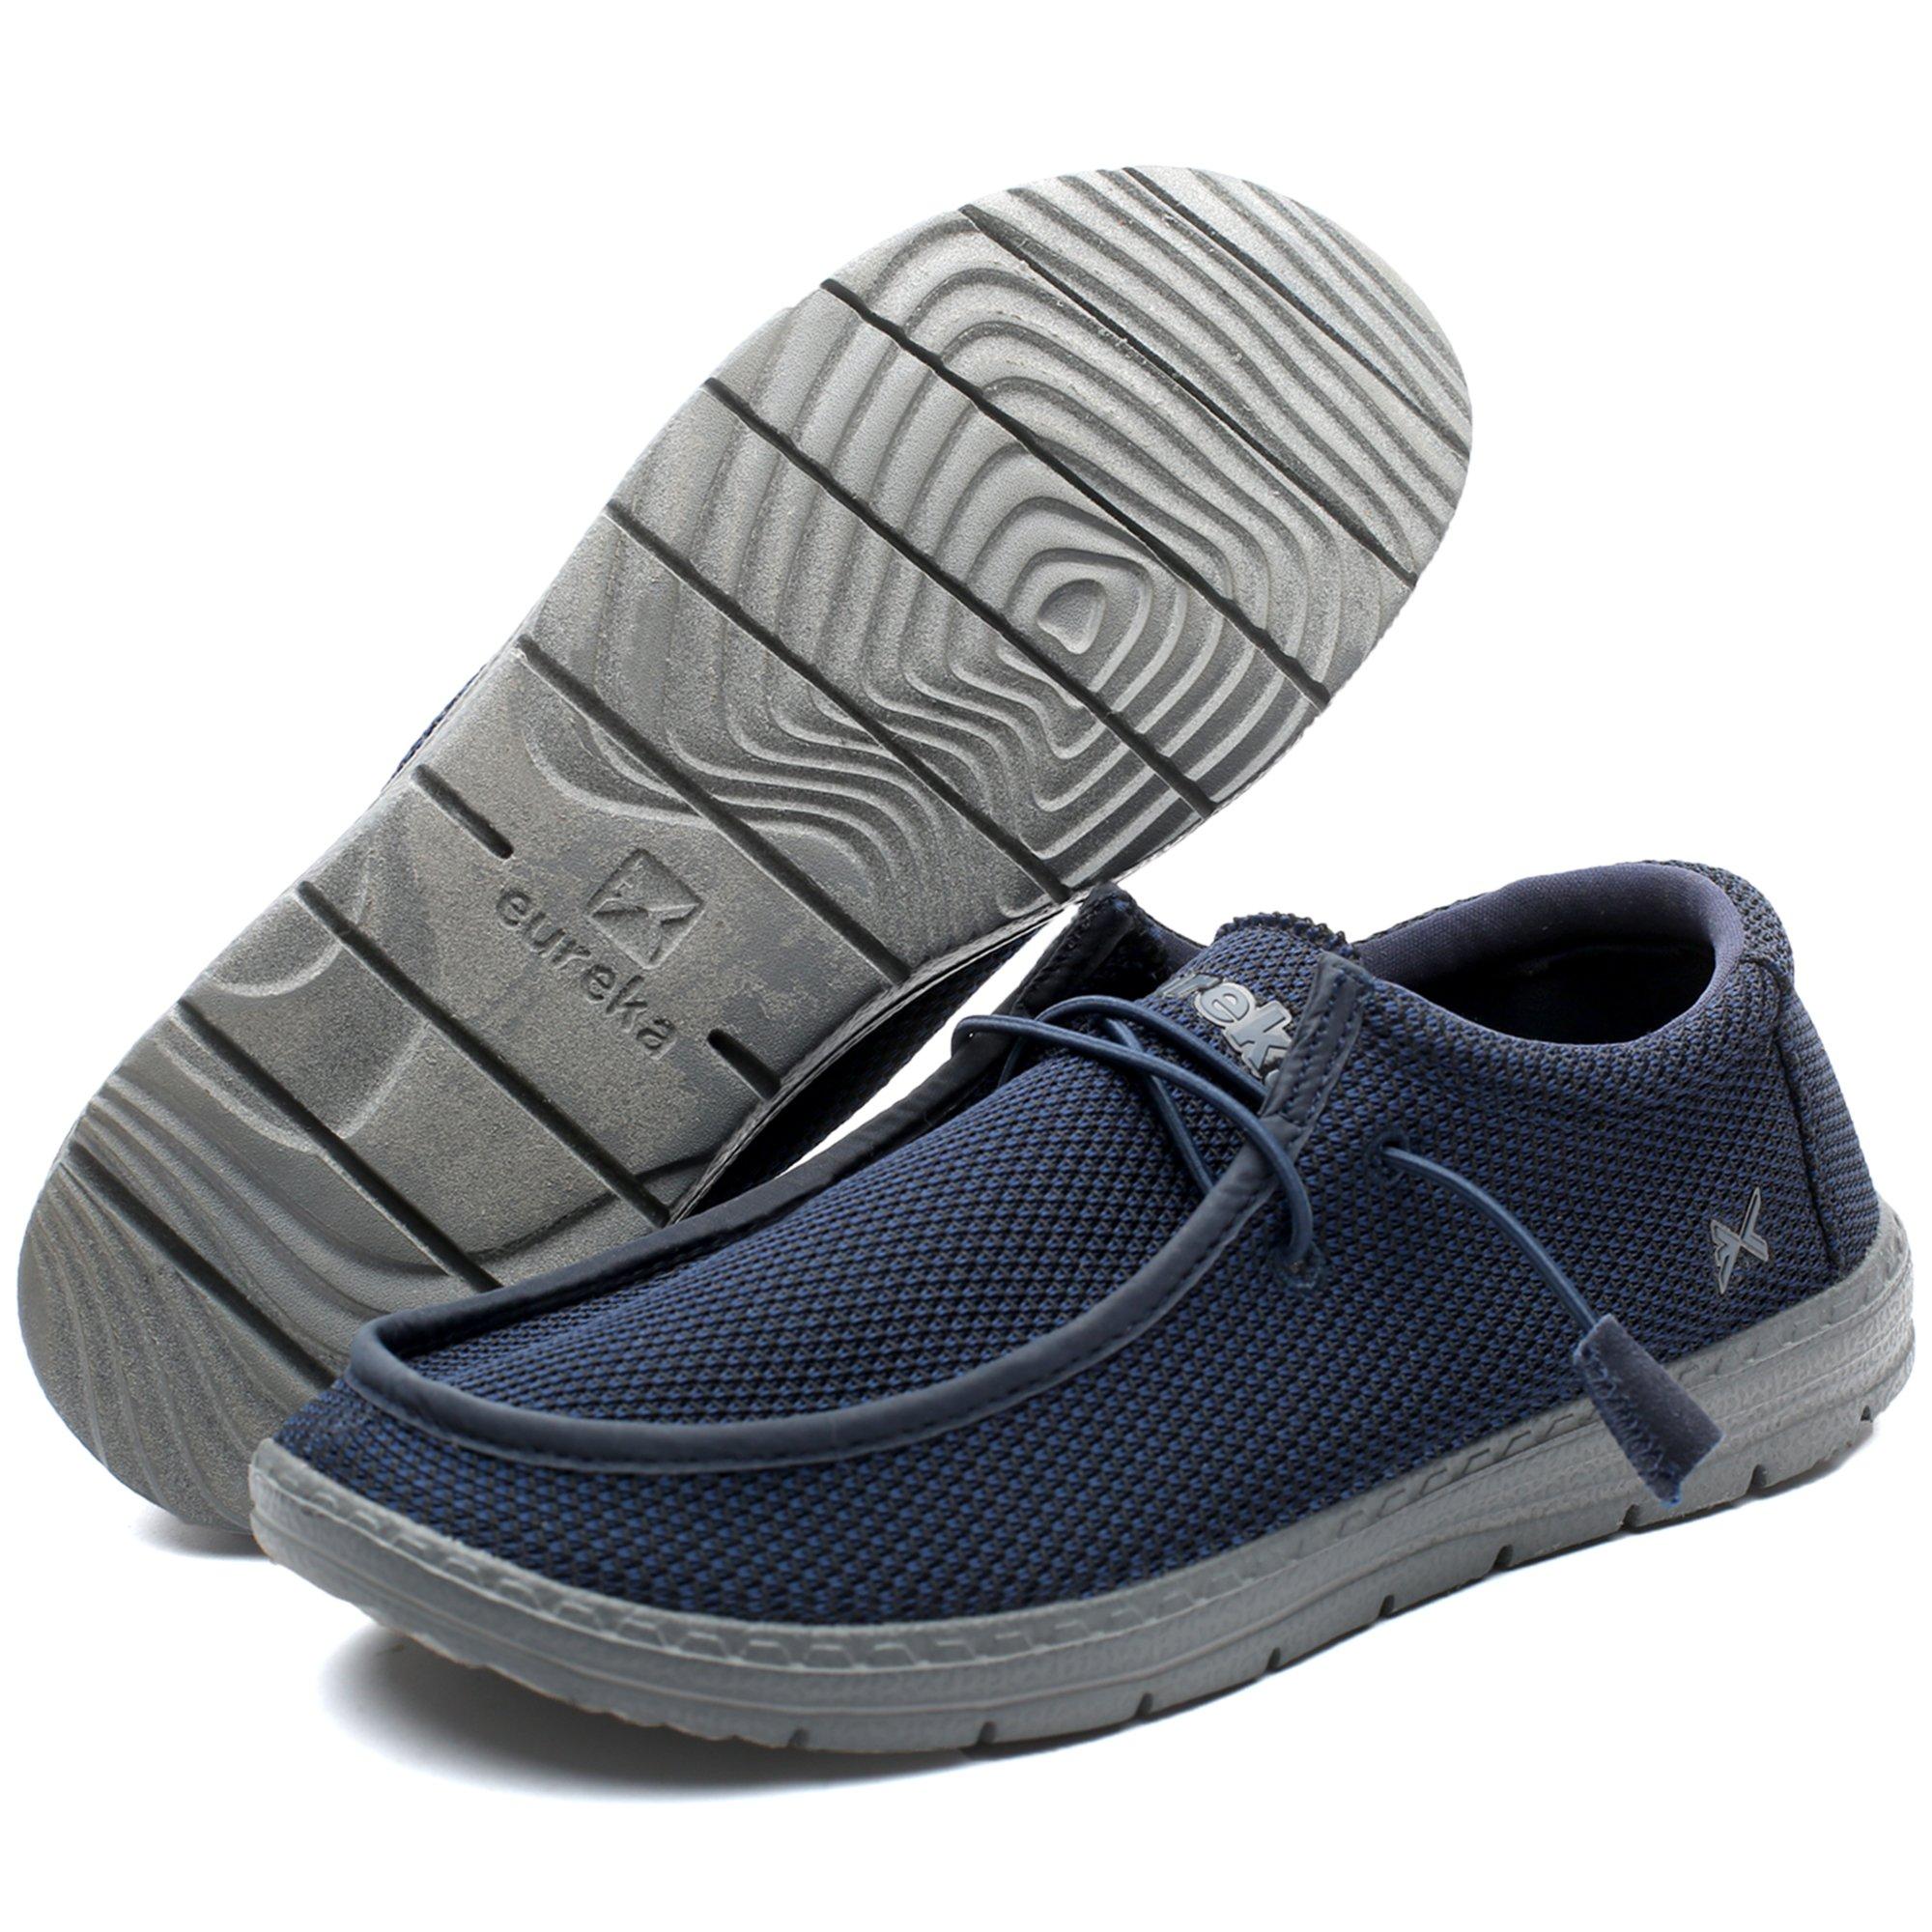 Eureka USA Traveler Pro Men's Casual Slip-On Sneaker, Comfort Stretch Moccasin Loafer and Walking Chukka Boot by Eureka USA